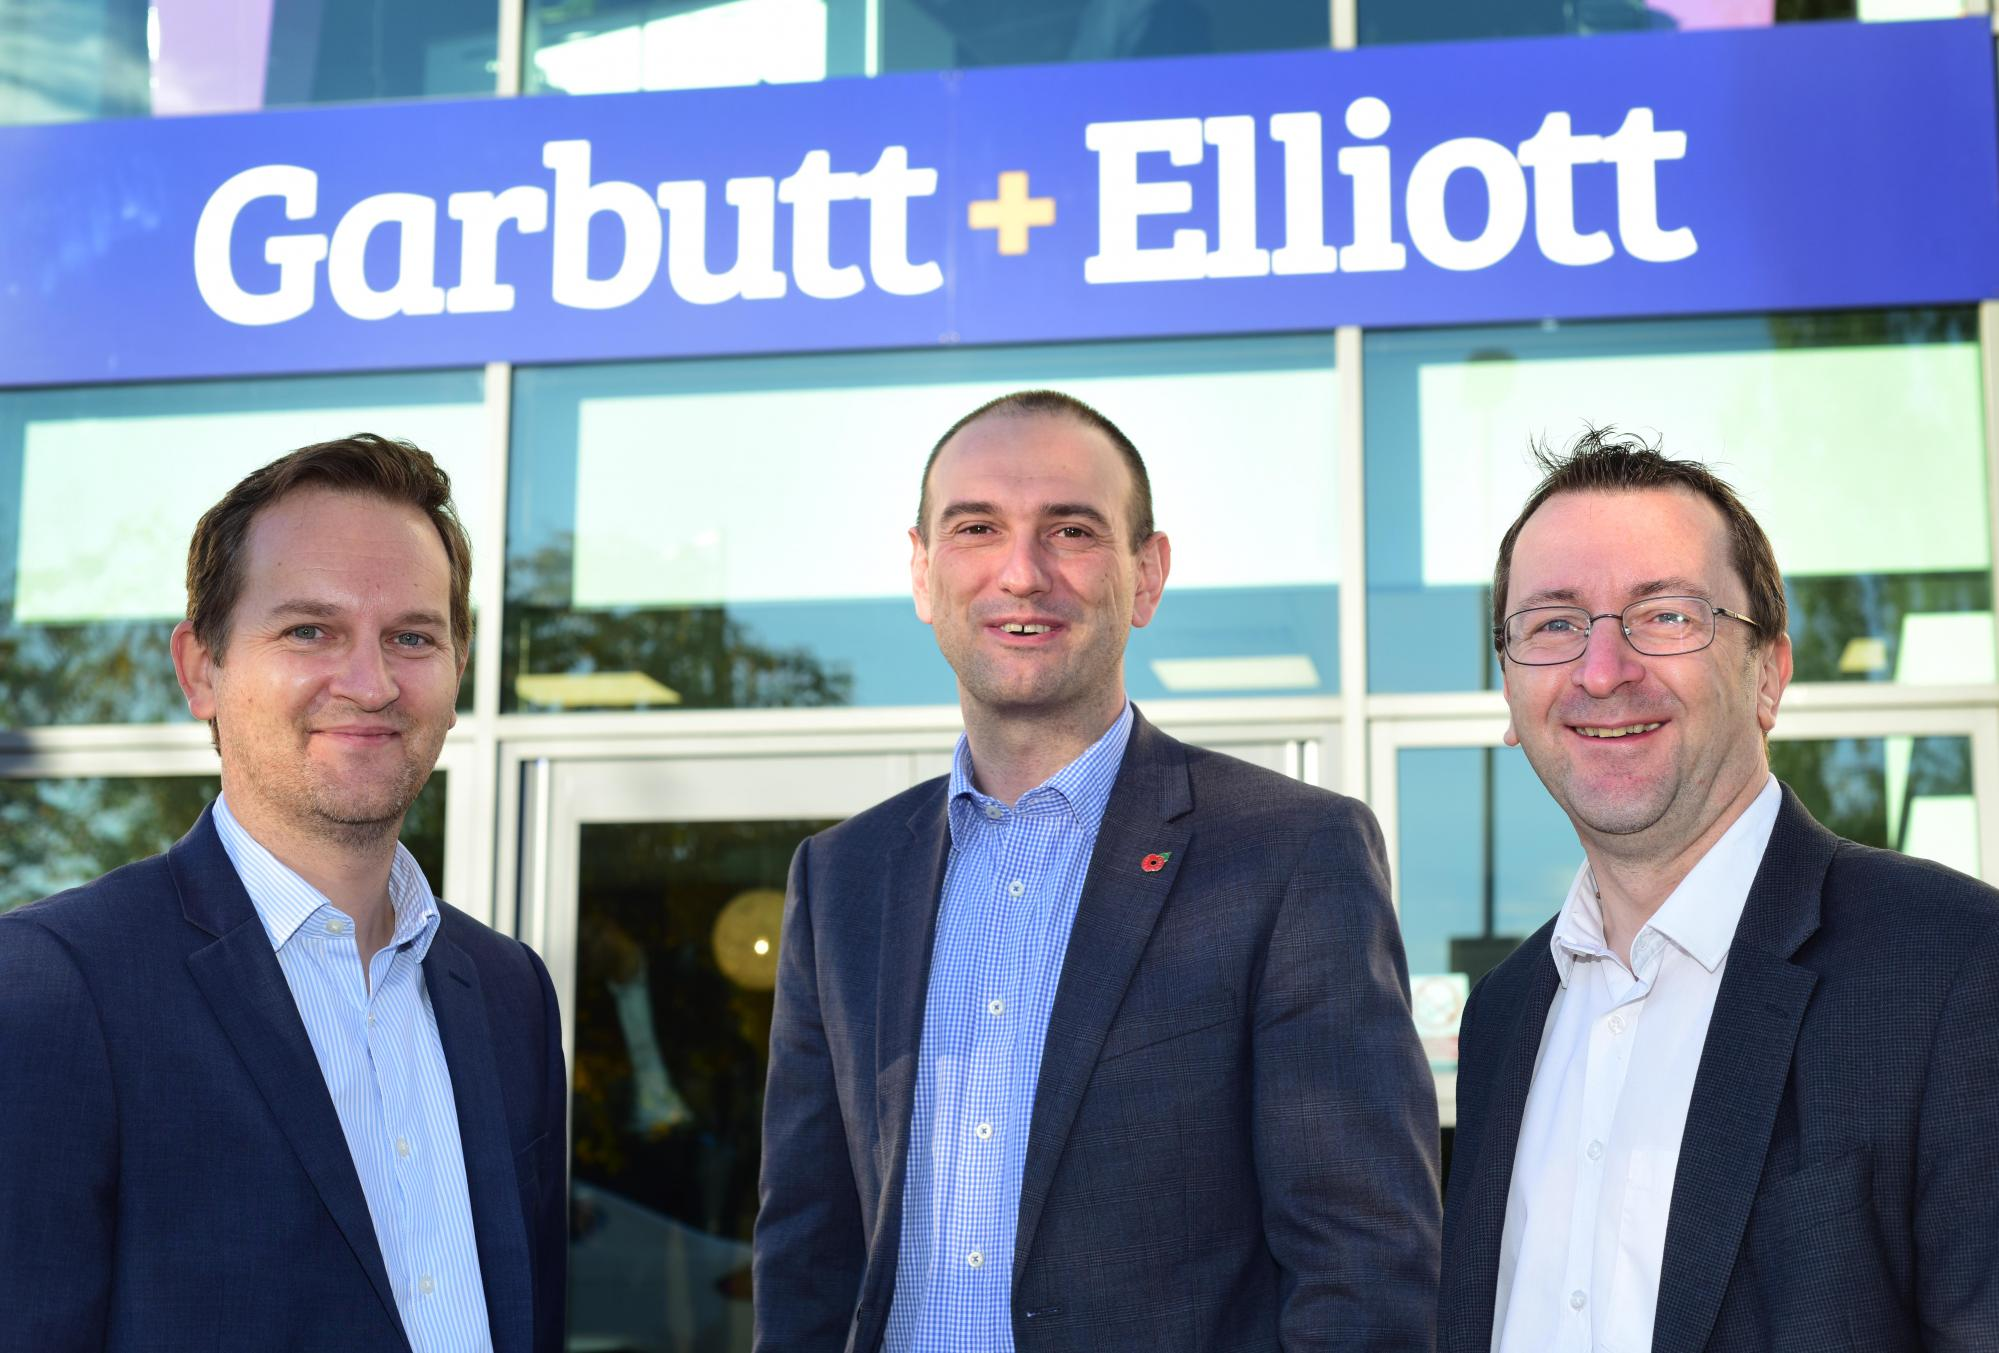 Garbutt and Elliott budget predictions for autumn 2018